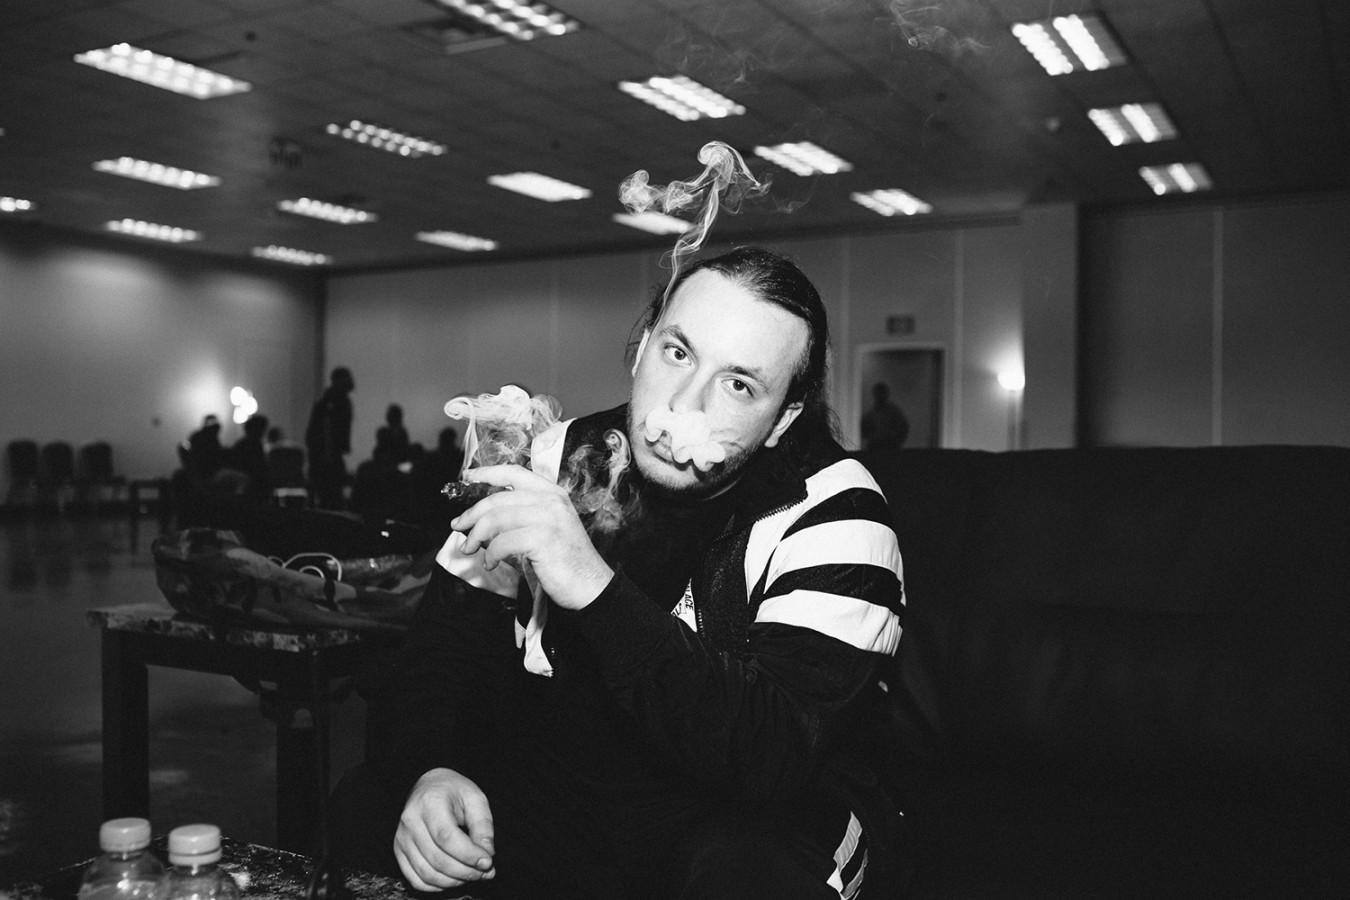 asap-rocky-tyler-the-creator-tour-backstage-25-1350x900